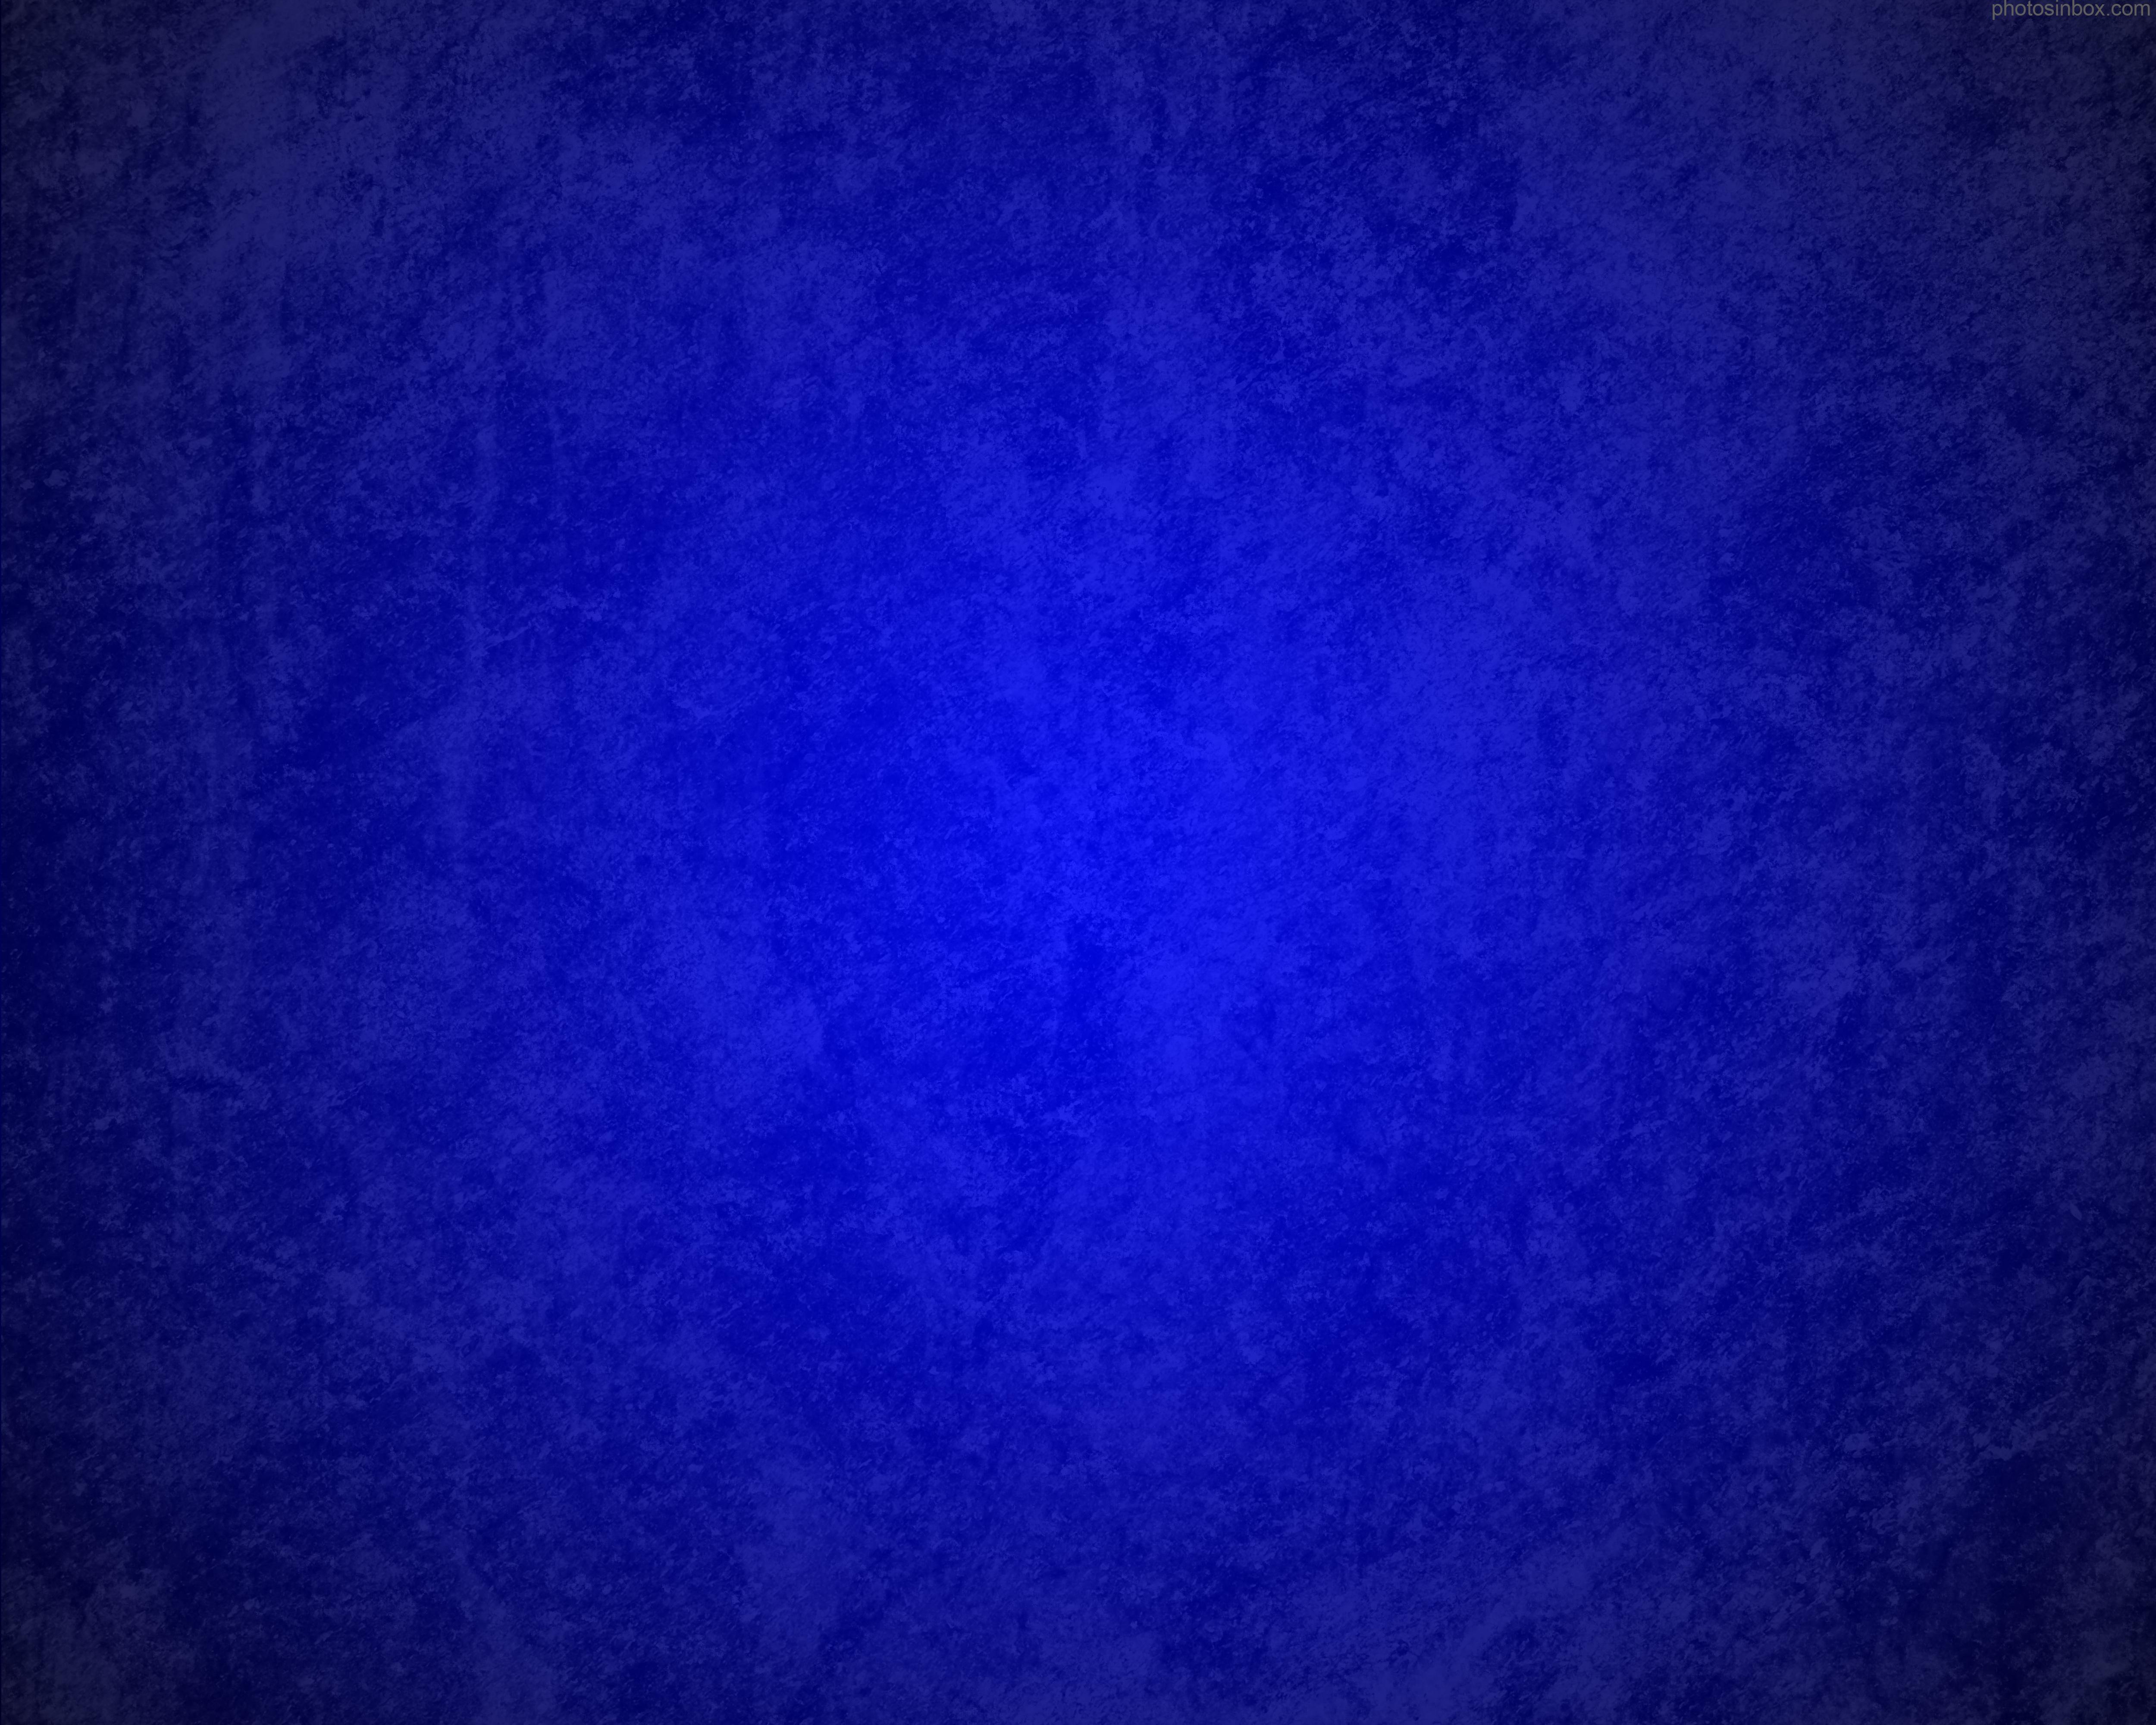 Grunge blue background PhotosInBox 5000x4000